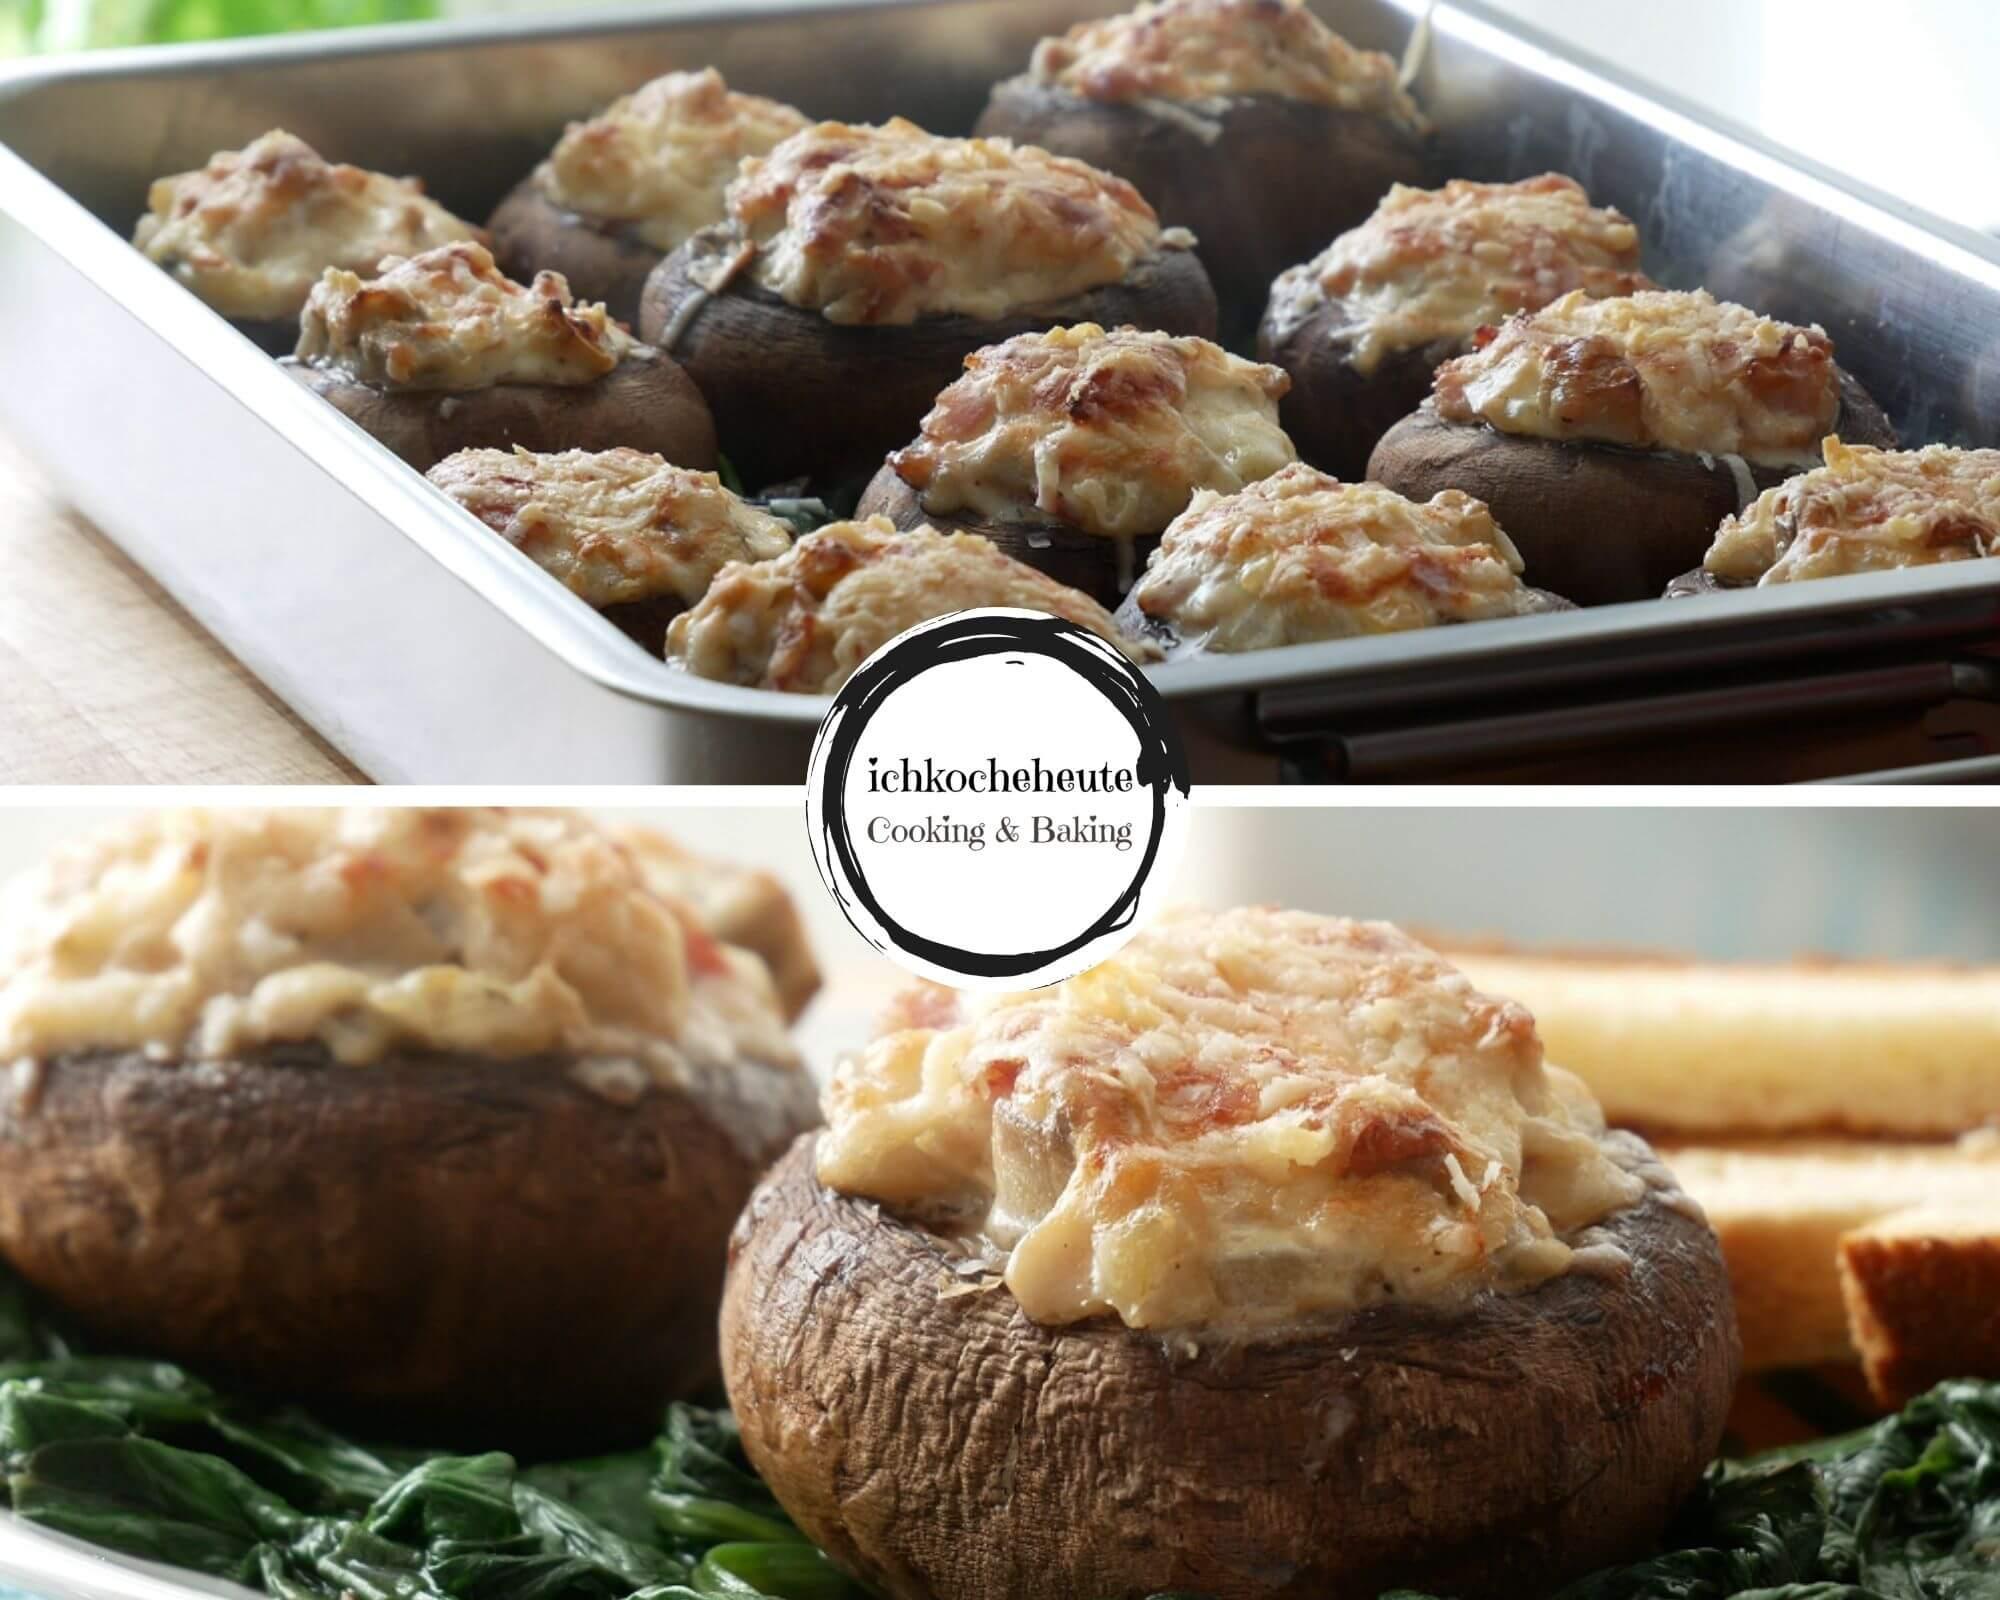 Serving Stuffed Mushrooms